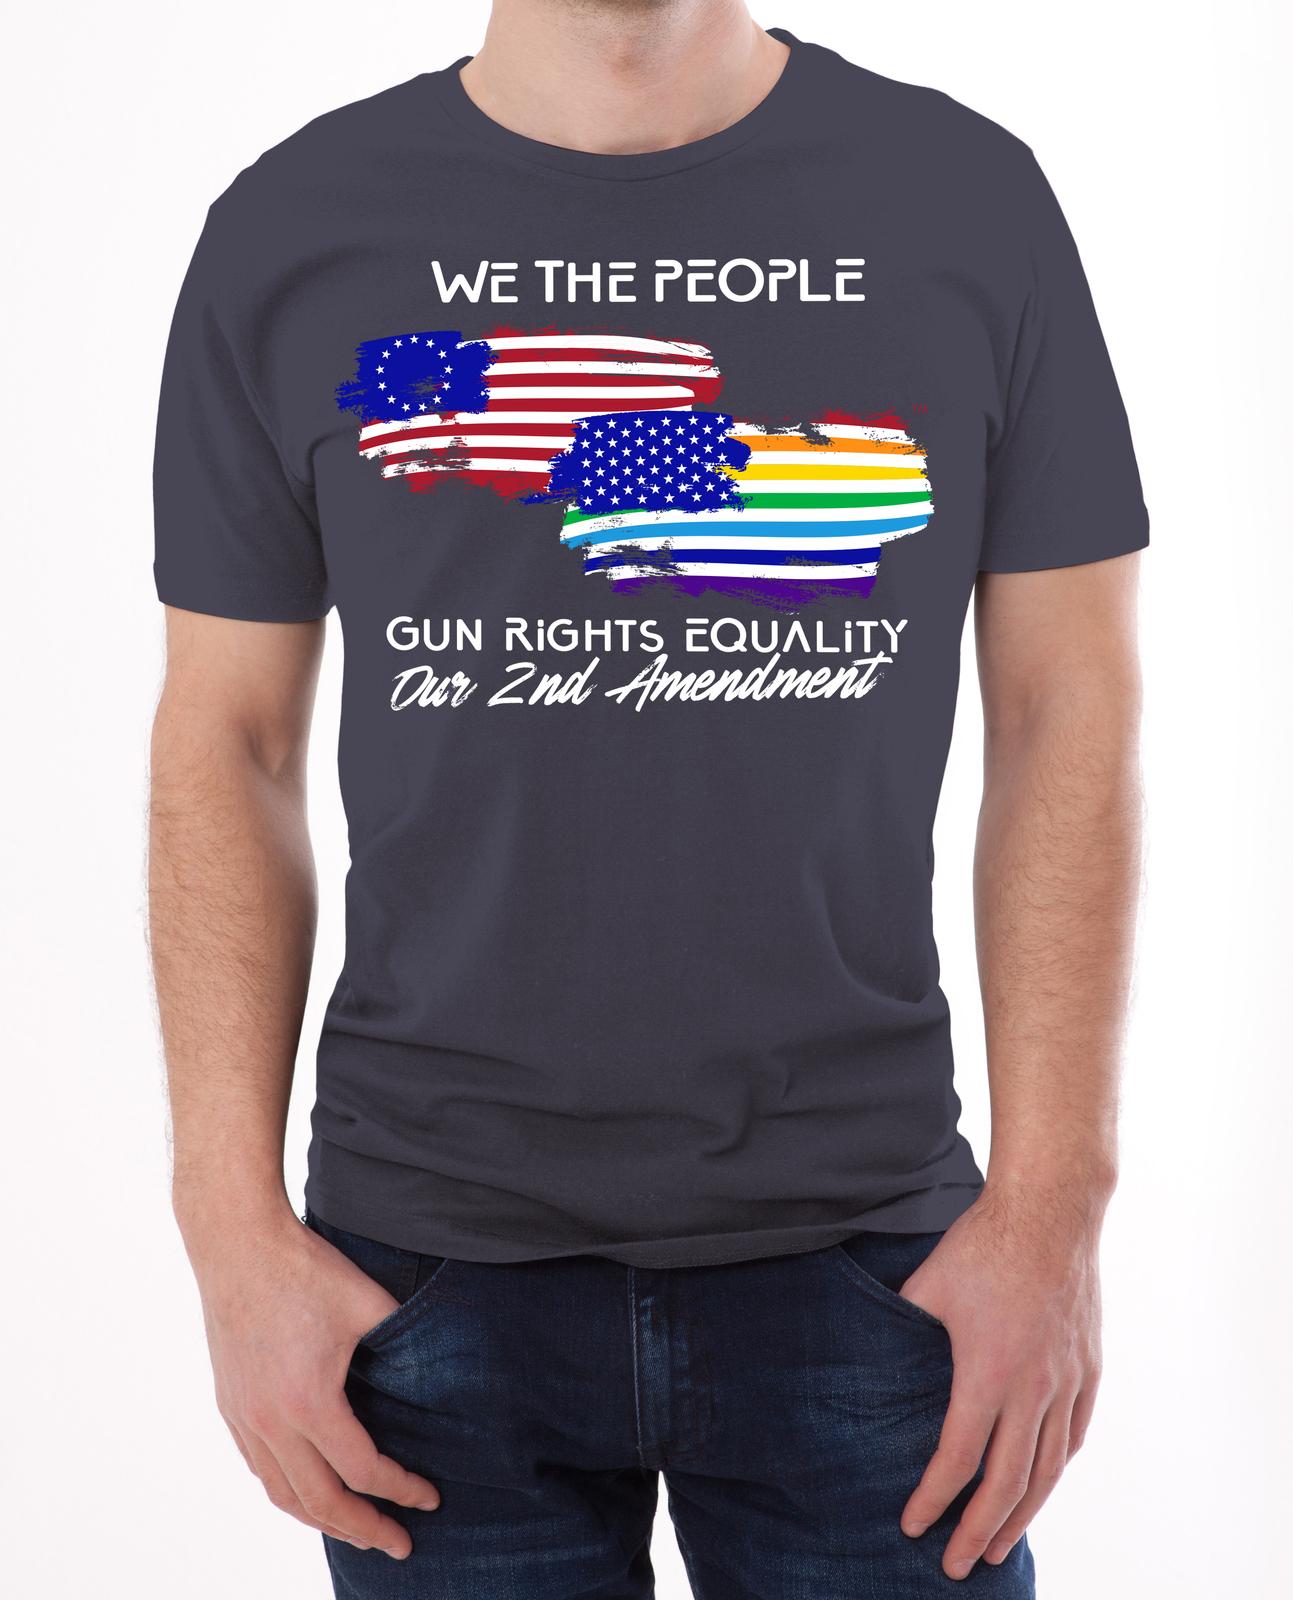 """Our Second Amendment"" T-shirt"